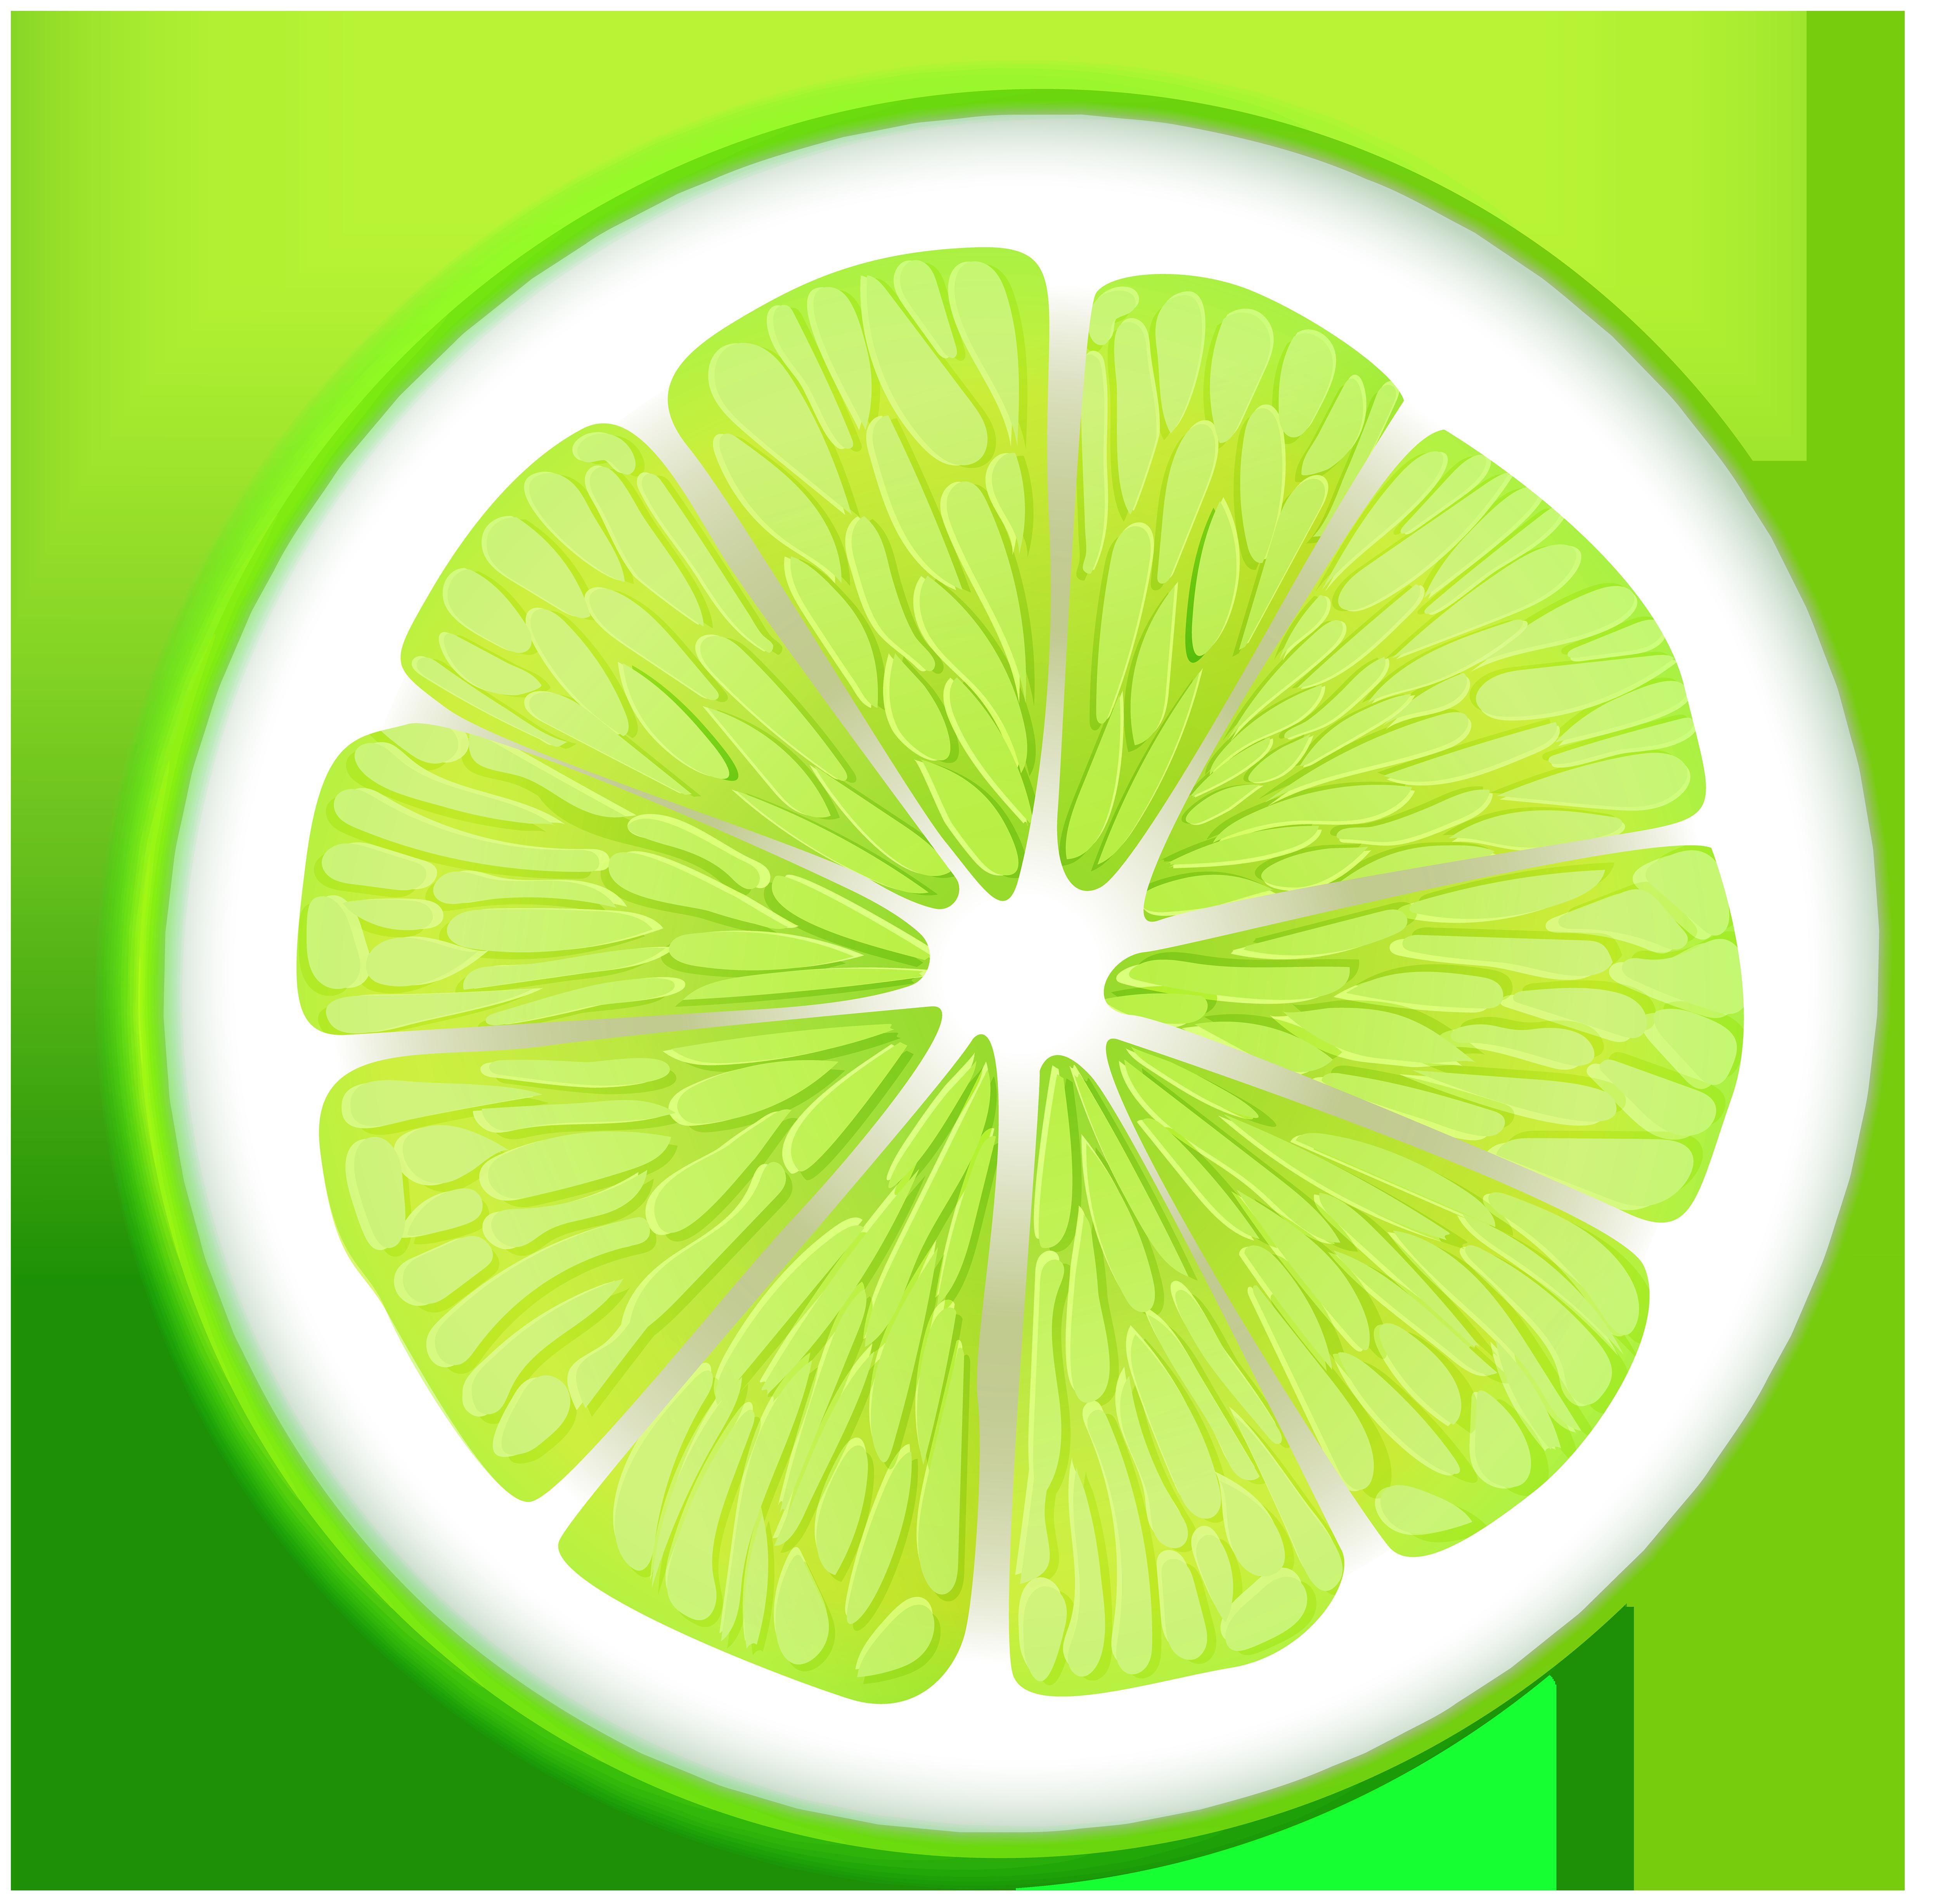 clipart download Lime clipart circle. Transparent png clip art.